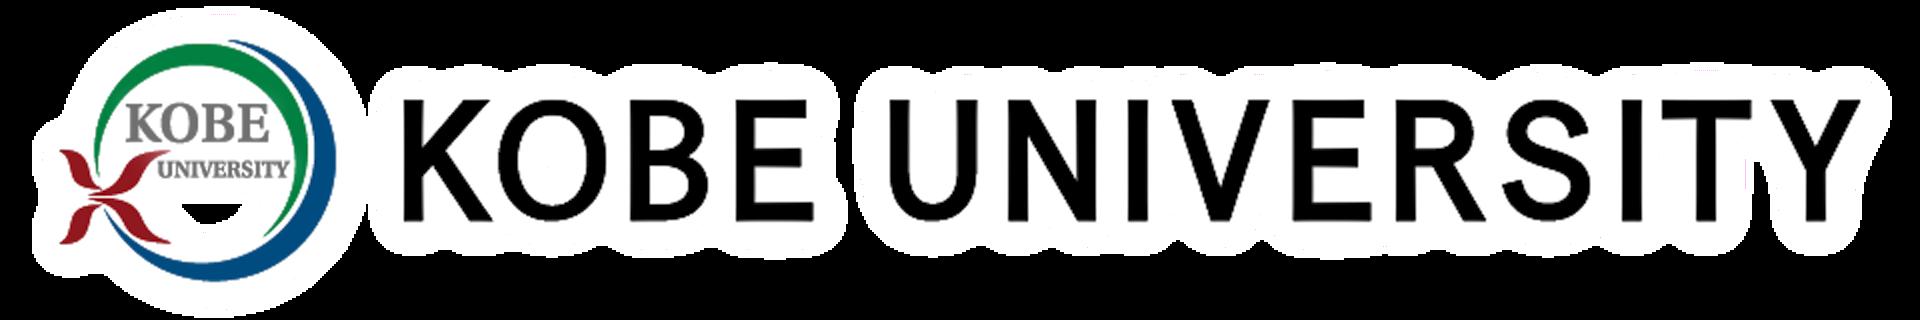 Logo 1510728274.png?ixlib=rb 1.1